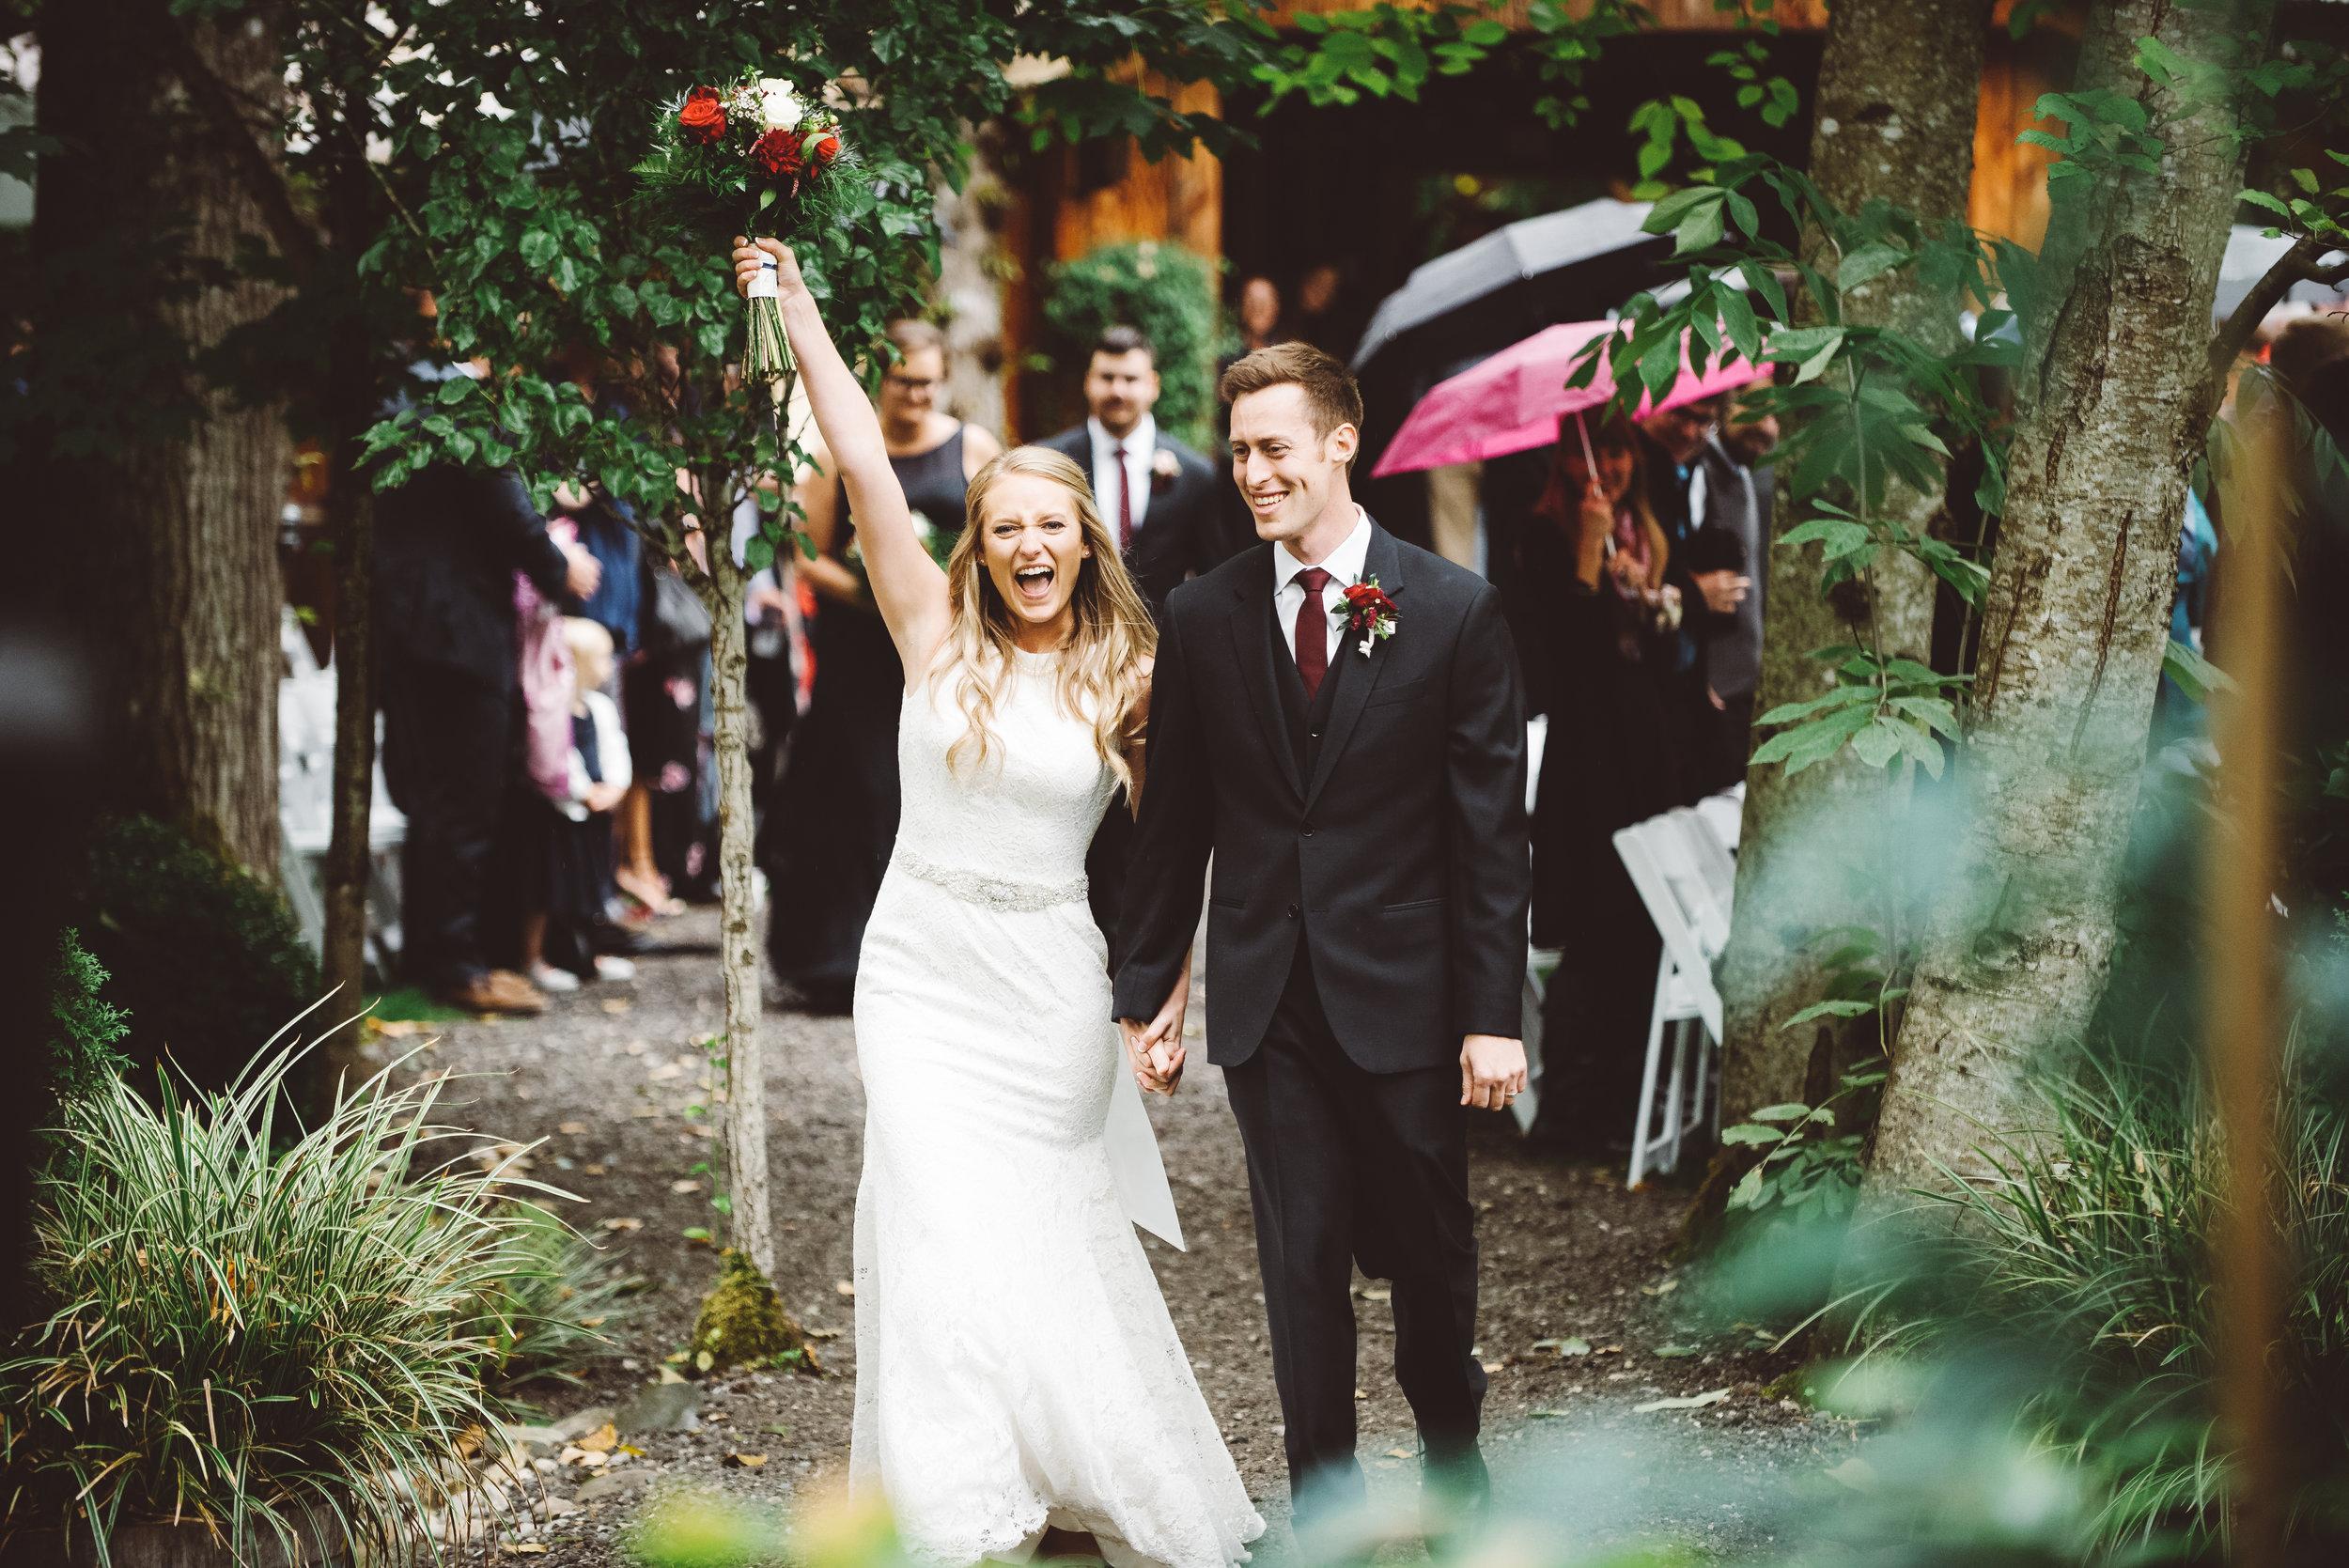 Caitylyn & Jesse - Wedding - Vintage-420.jpg